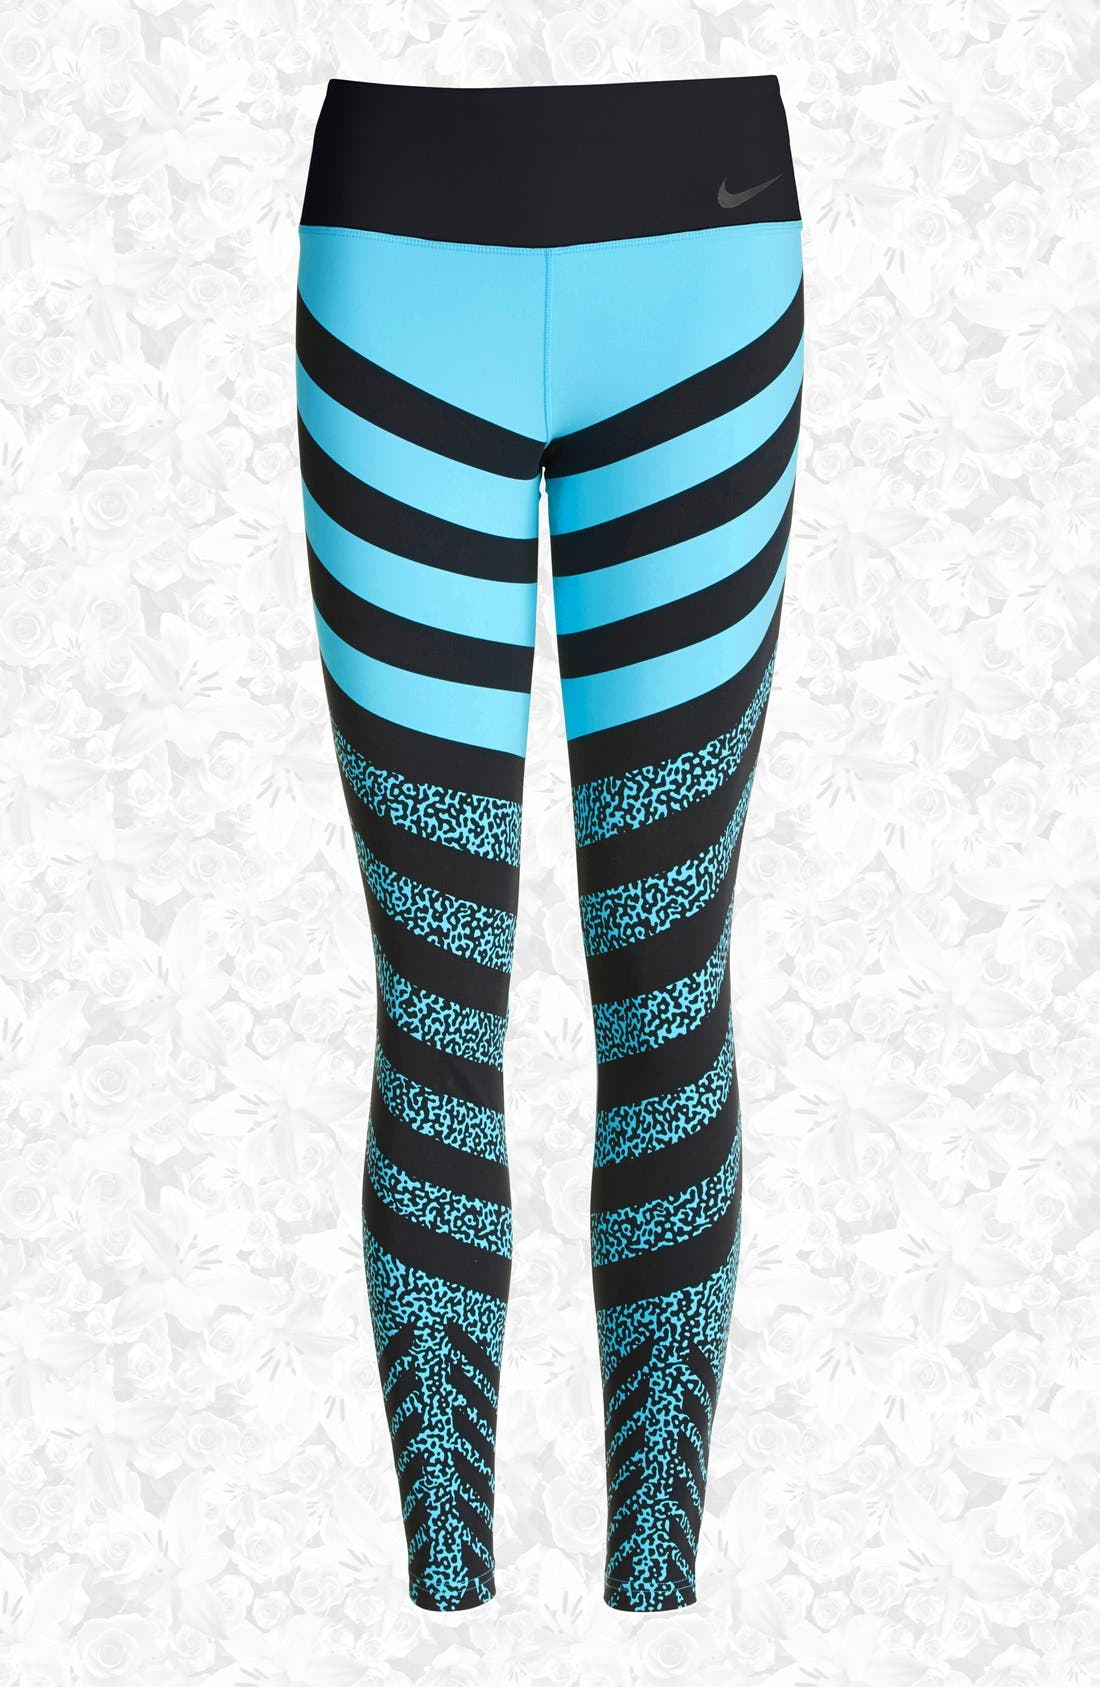 Alternate Image 1 Selected - Nike 'Legendary - Mezzo Zebra' Training Tights